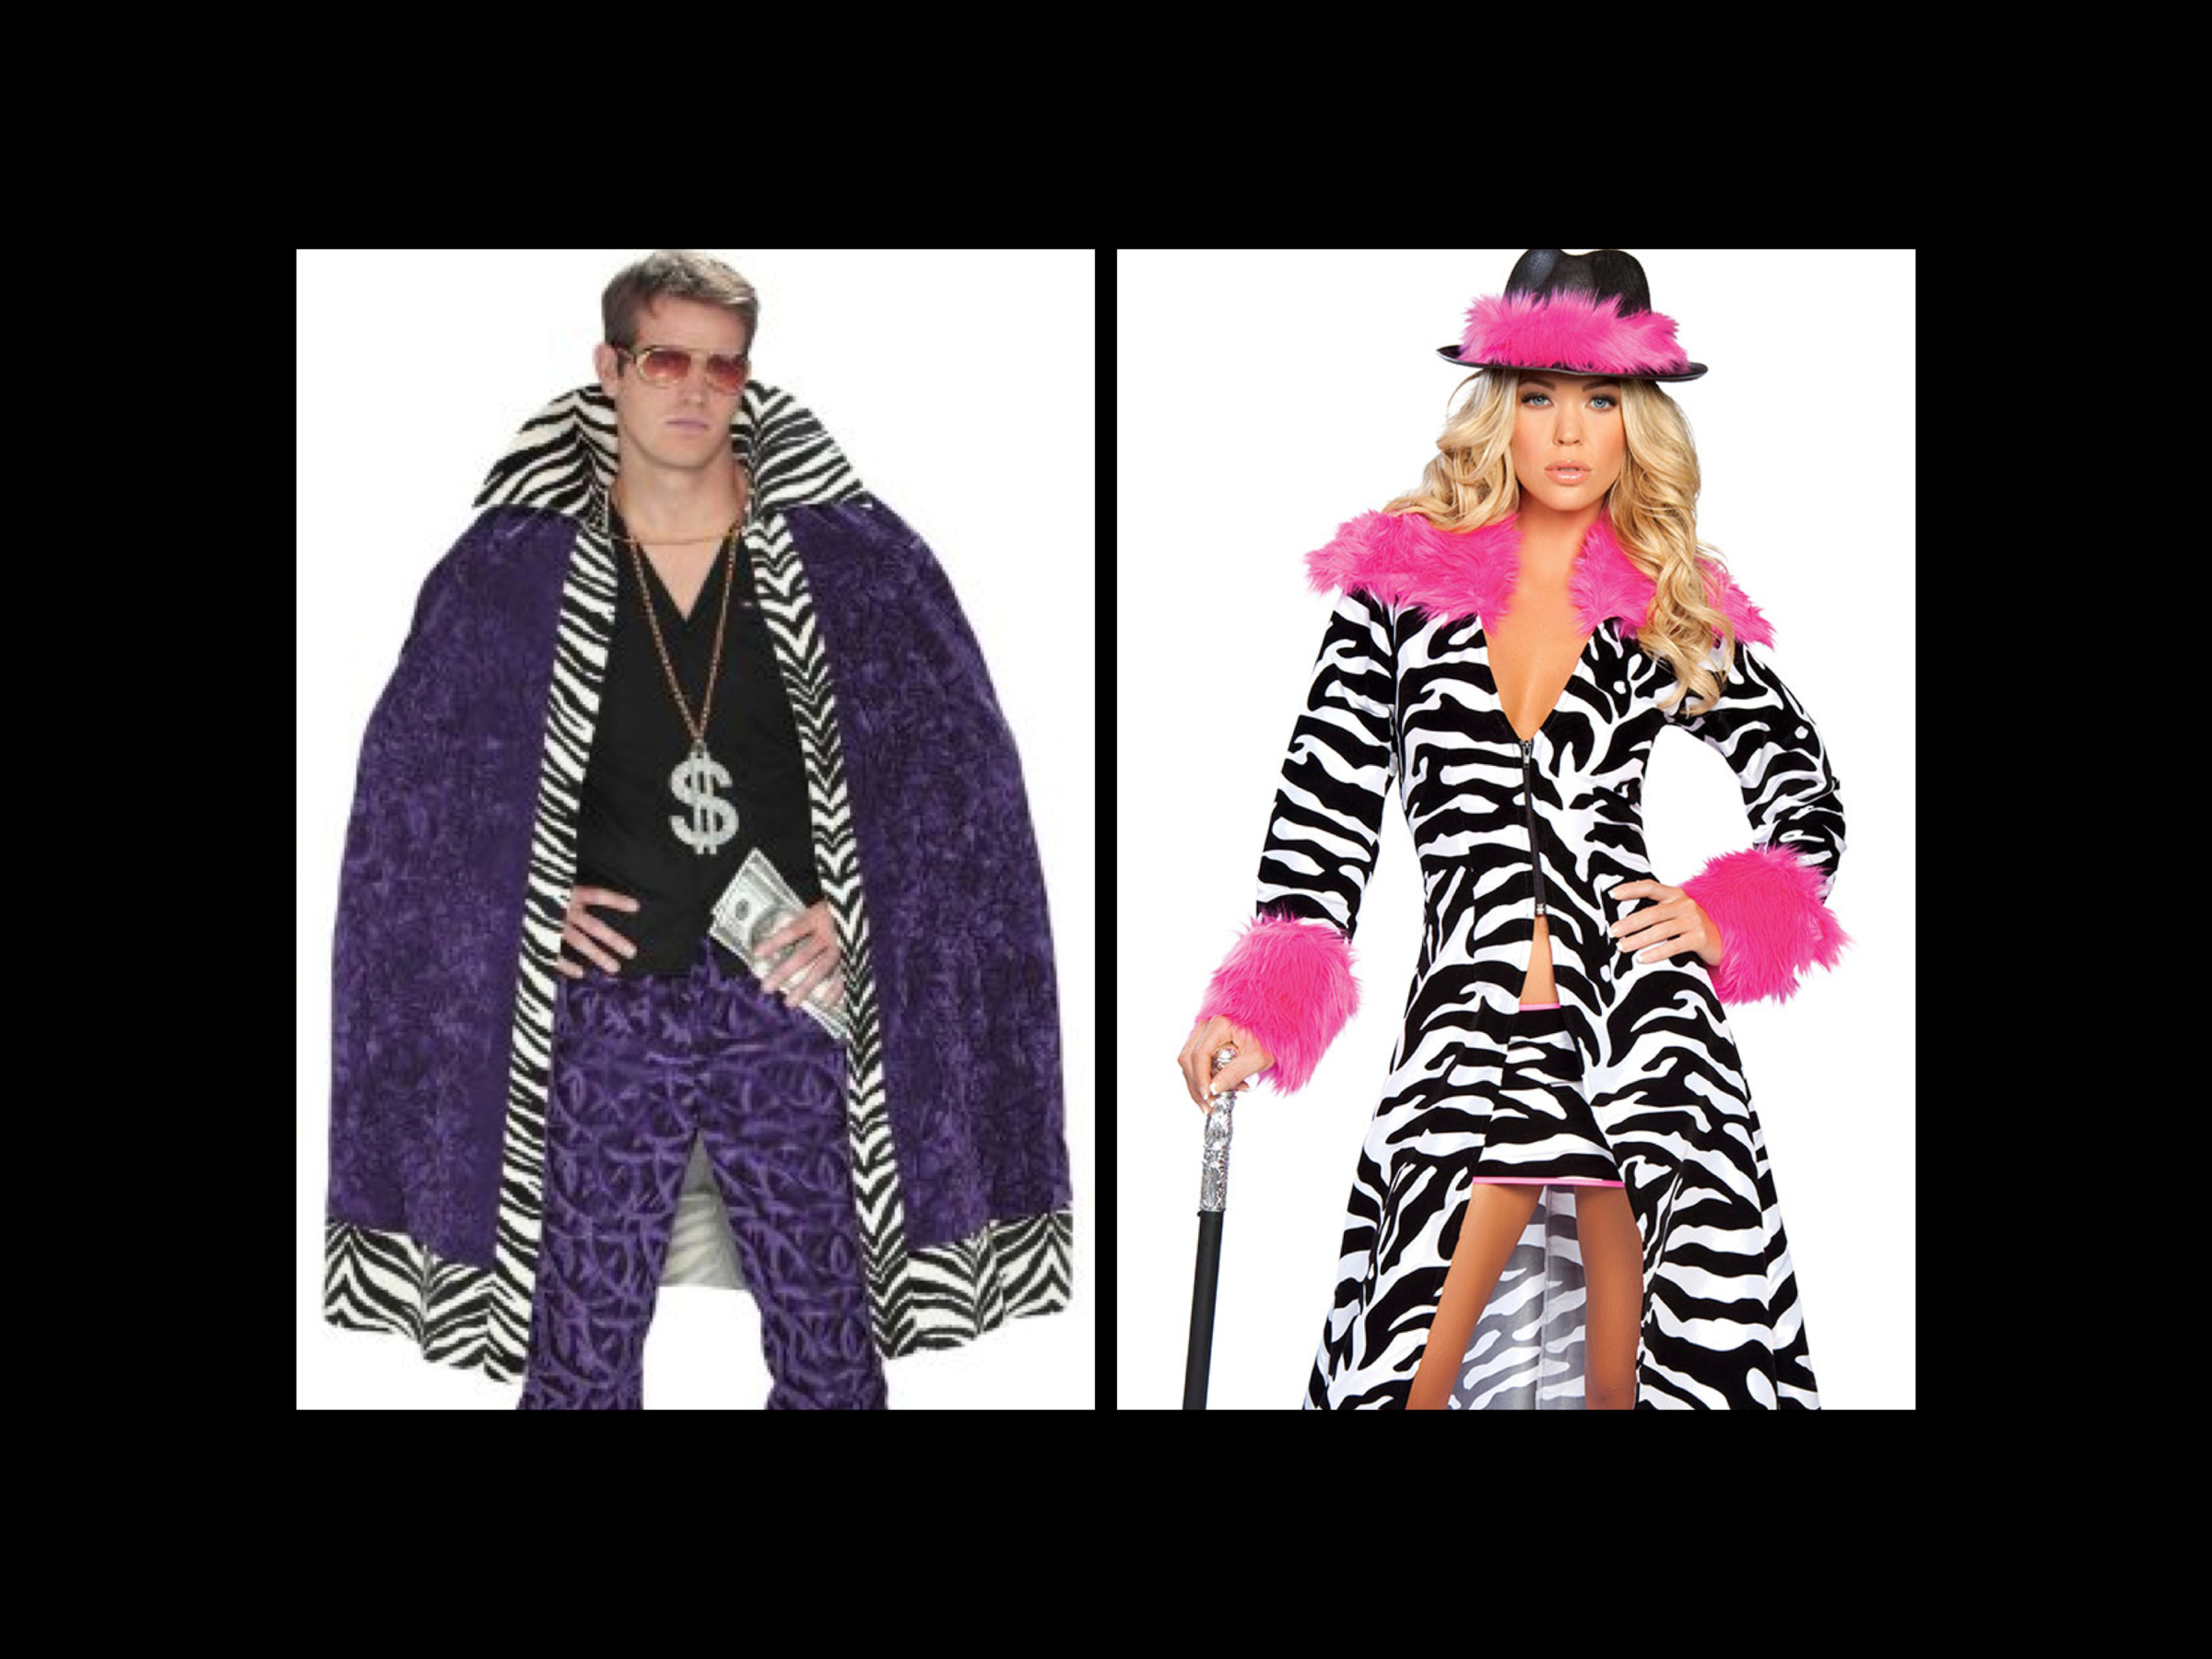 Group Halloween Zebra Costumes